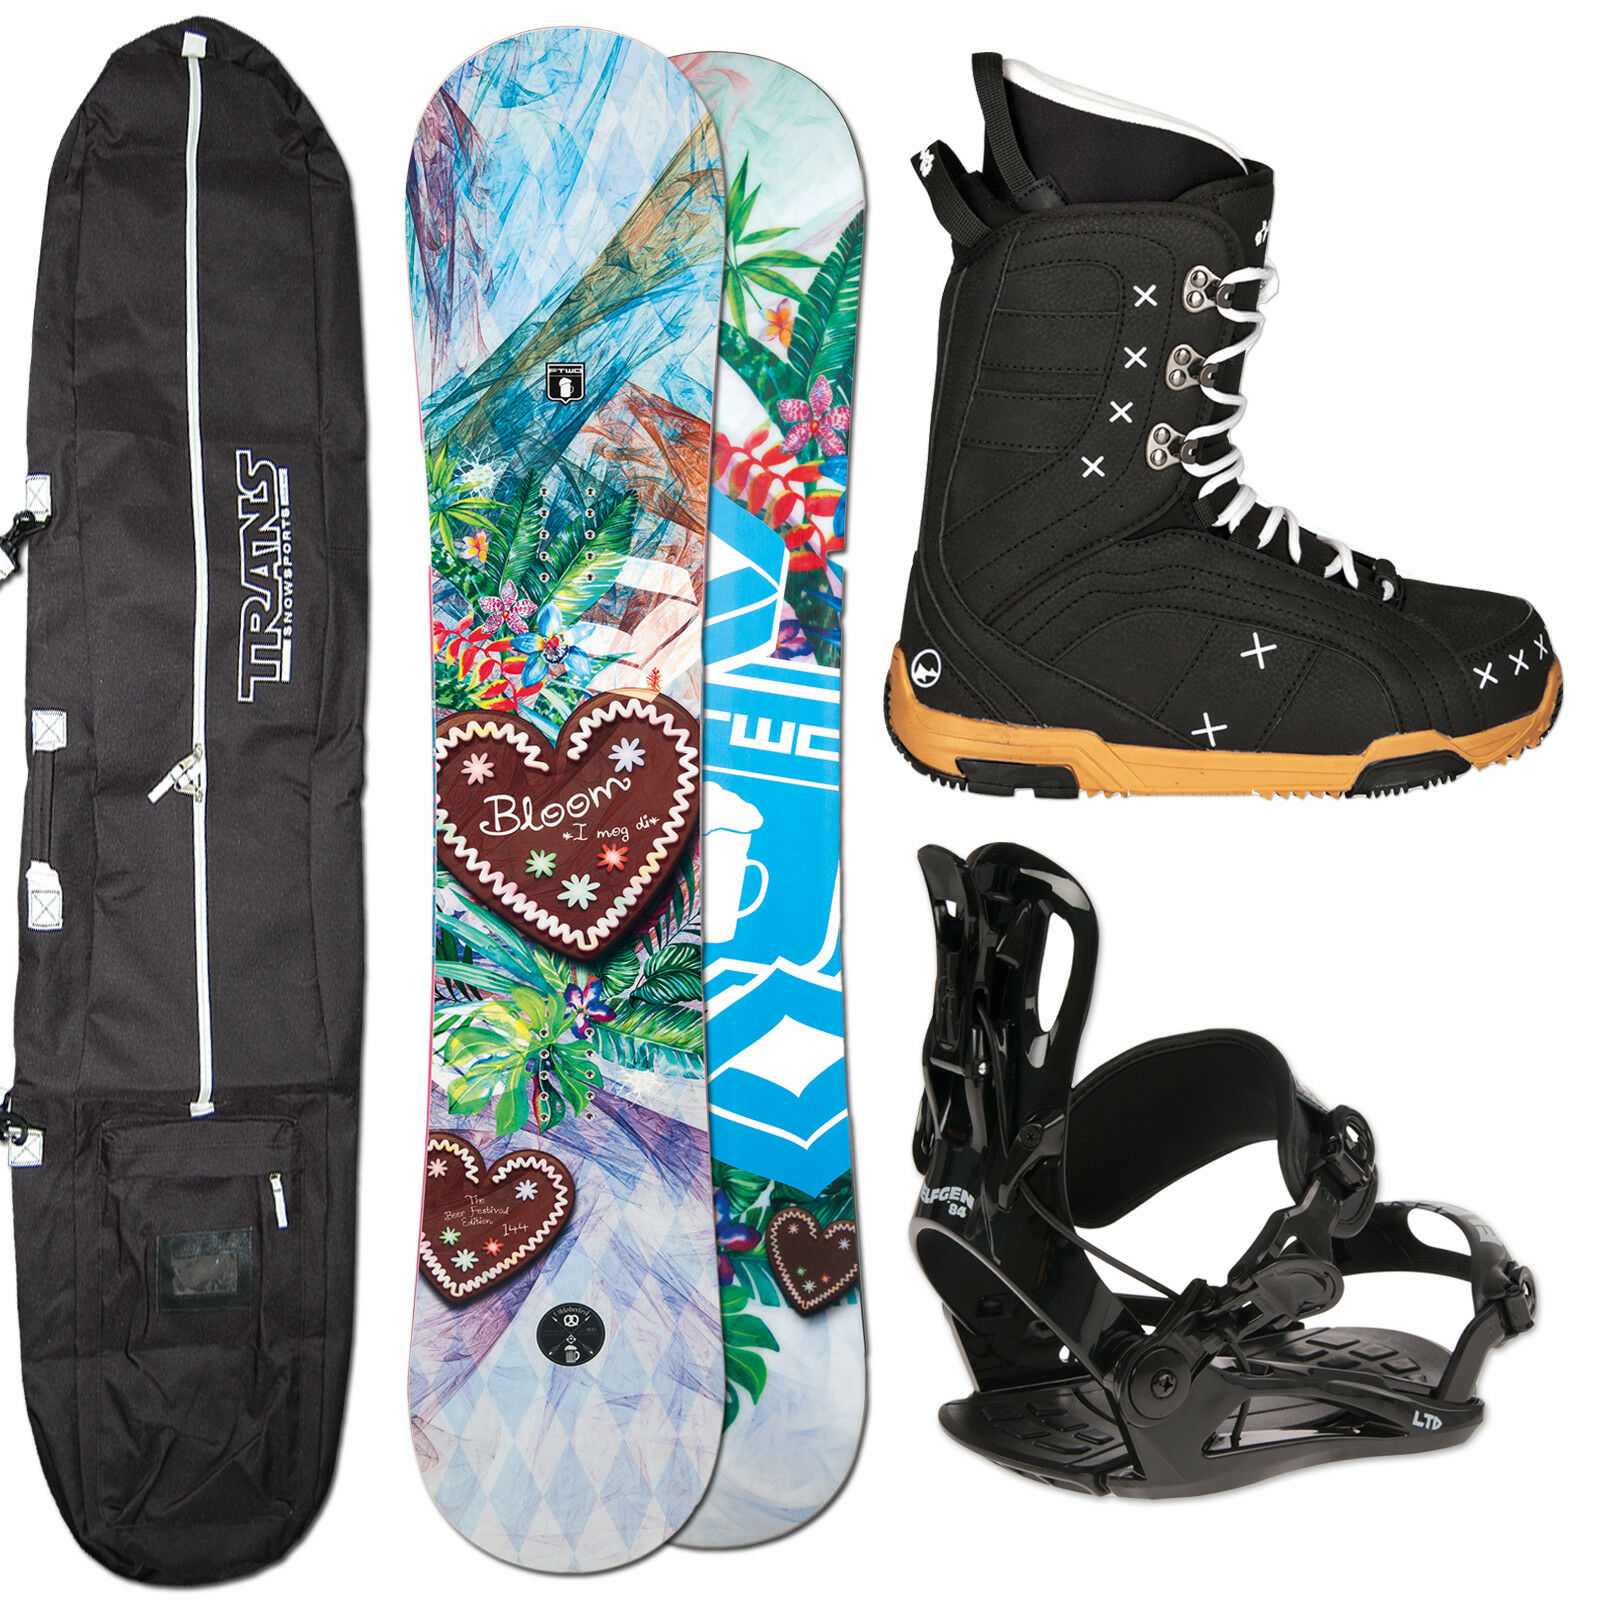 Snowboard Mujer Ftwo Bloom 140 cm + Fastec Fijación Talla S + botas + Bolsa